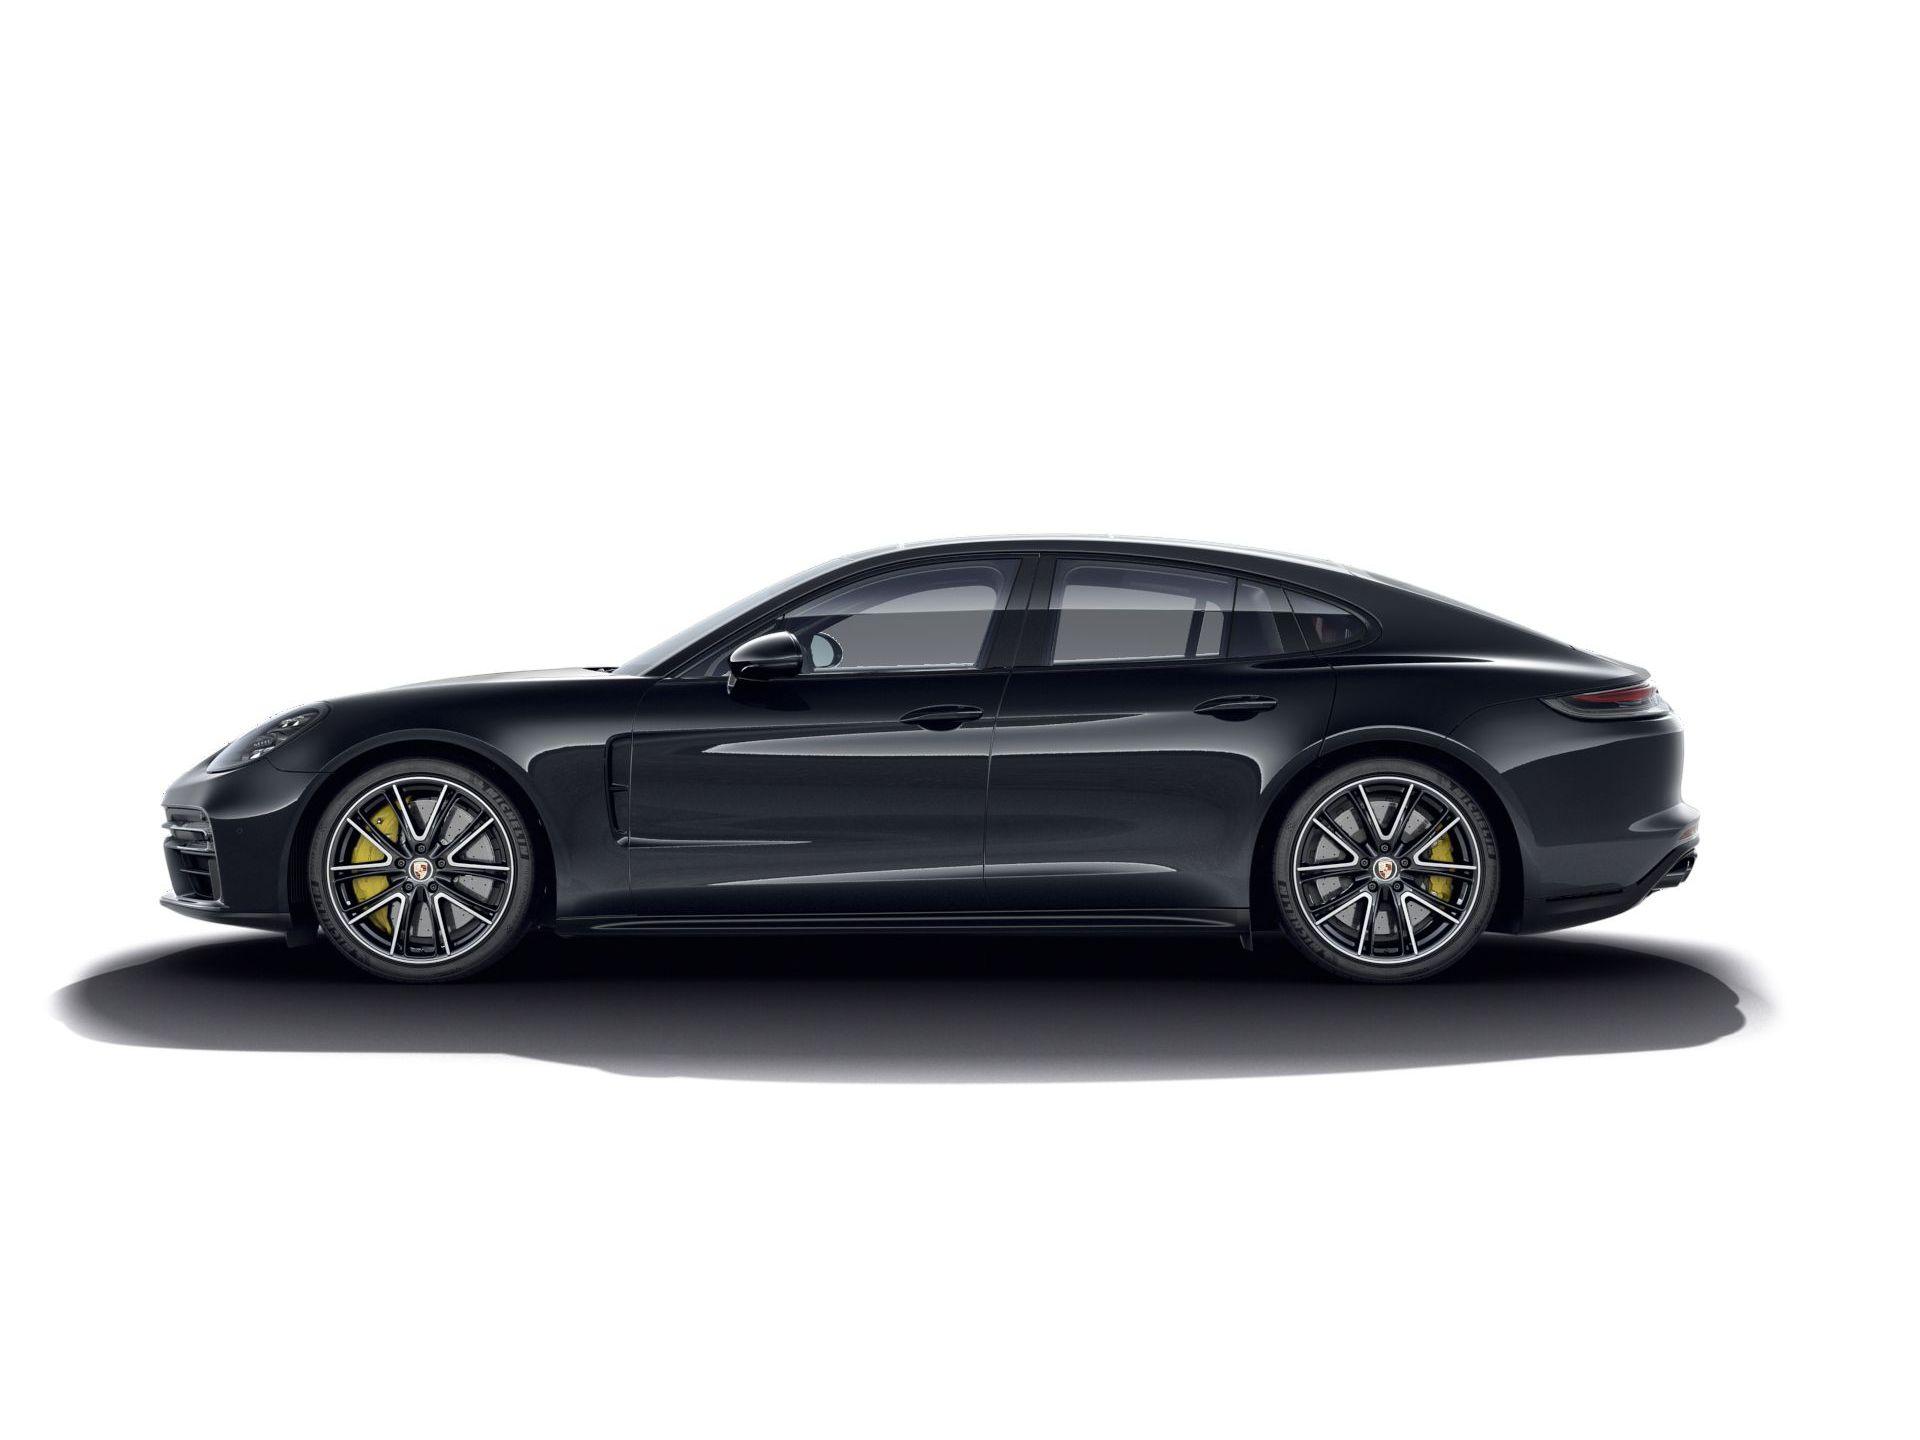 2021 Porsche Panamera Turbo S – 2